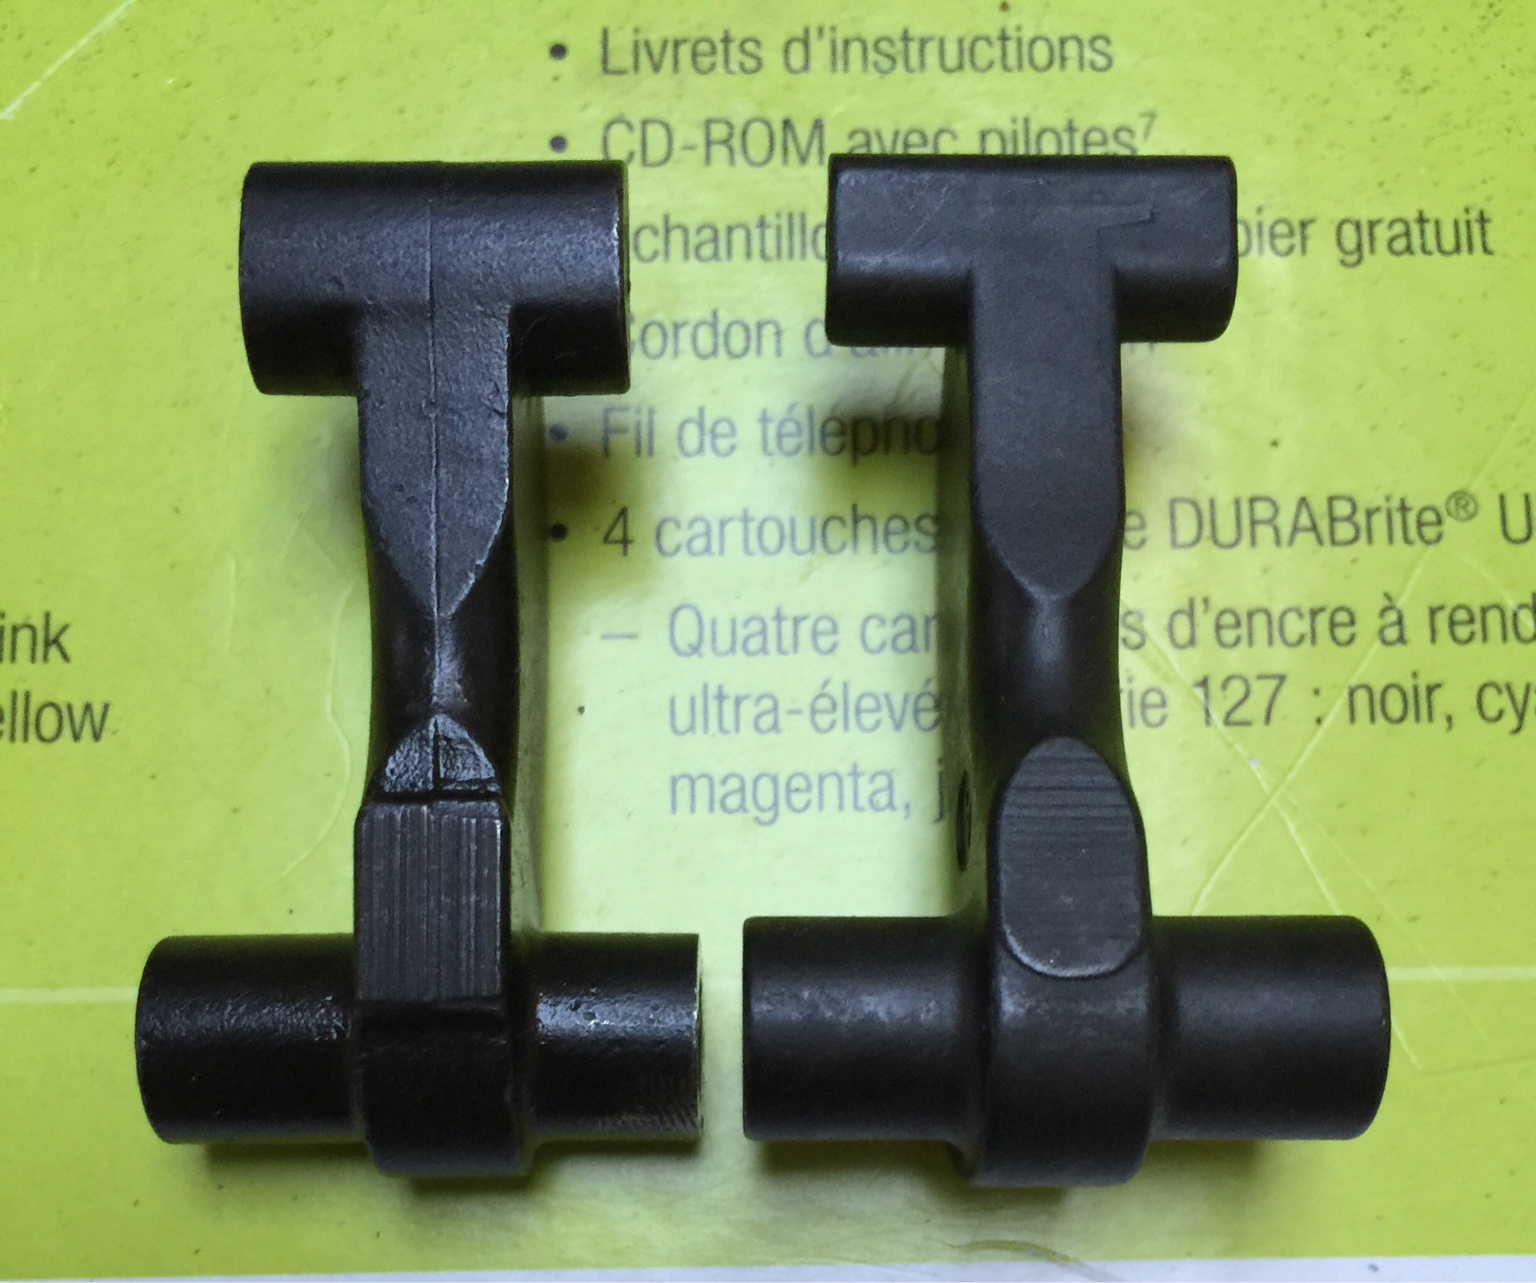 Installed ALG AKT Trigger in the Saiga IZ132Z - Long Guns